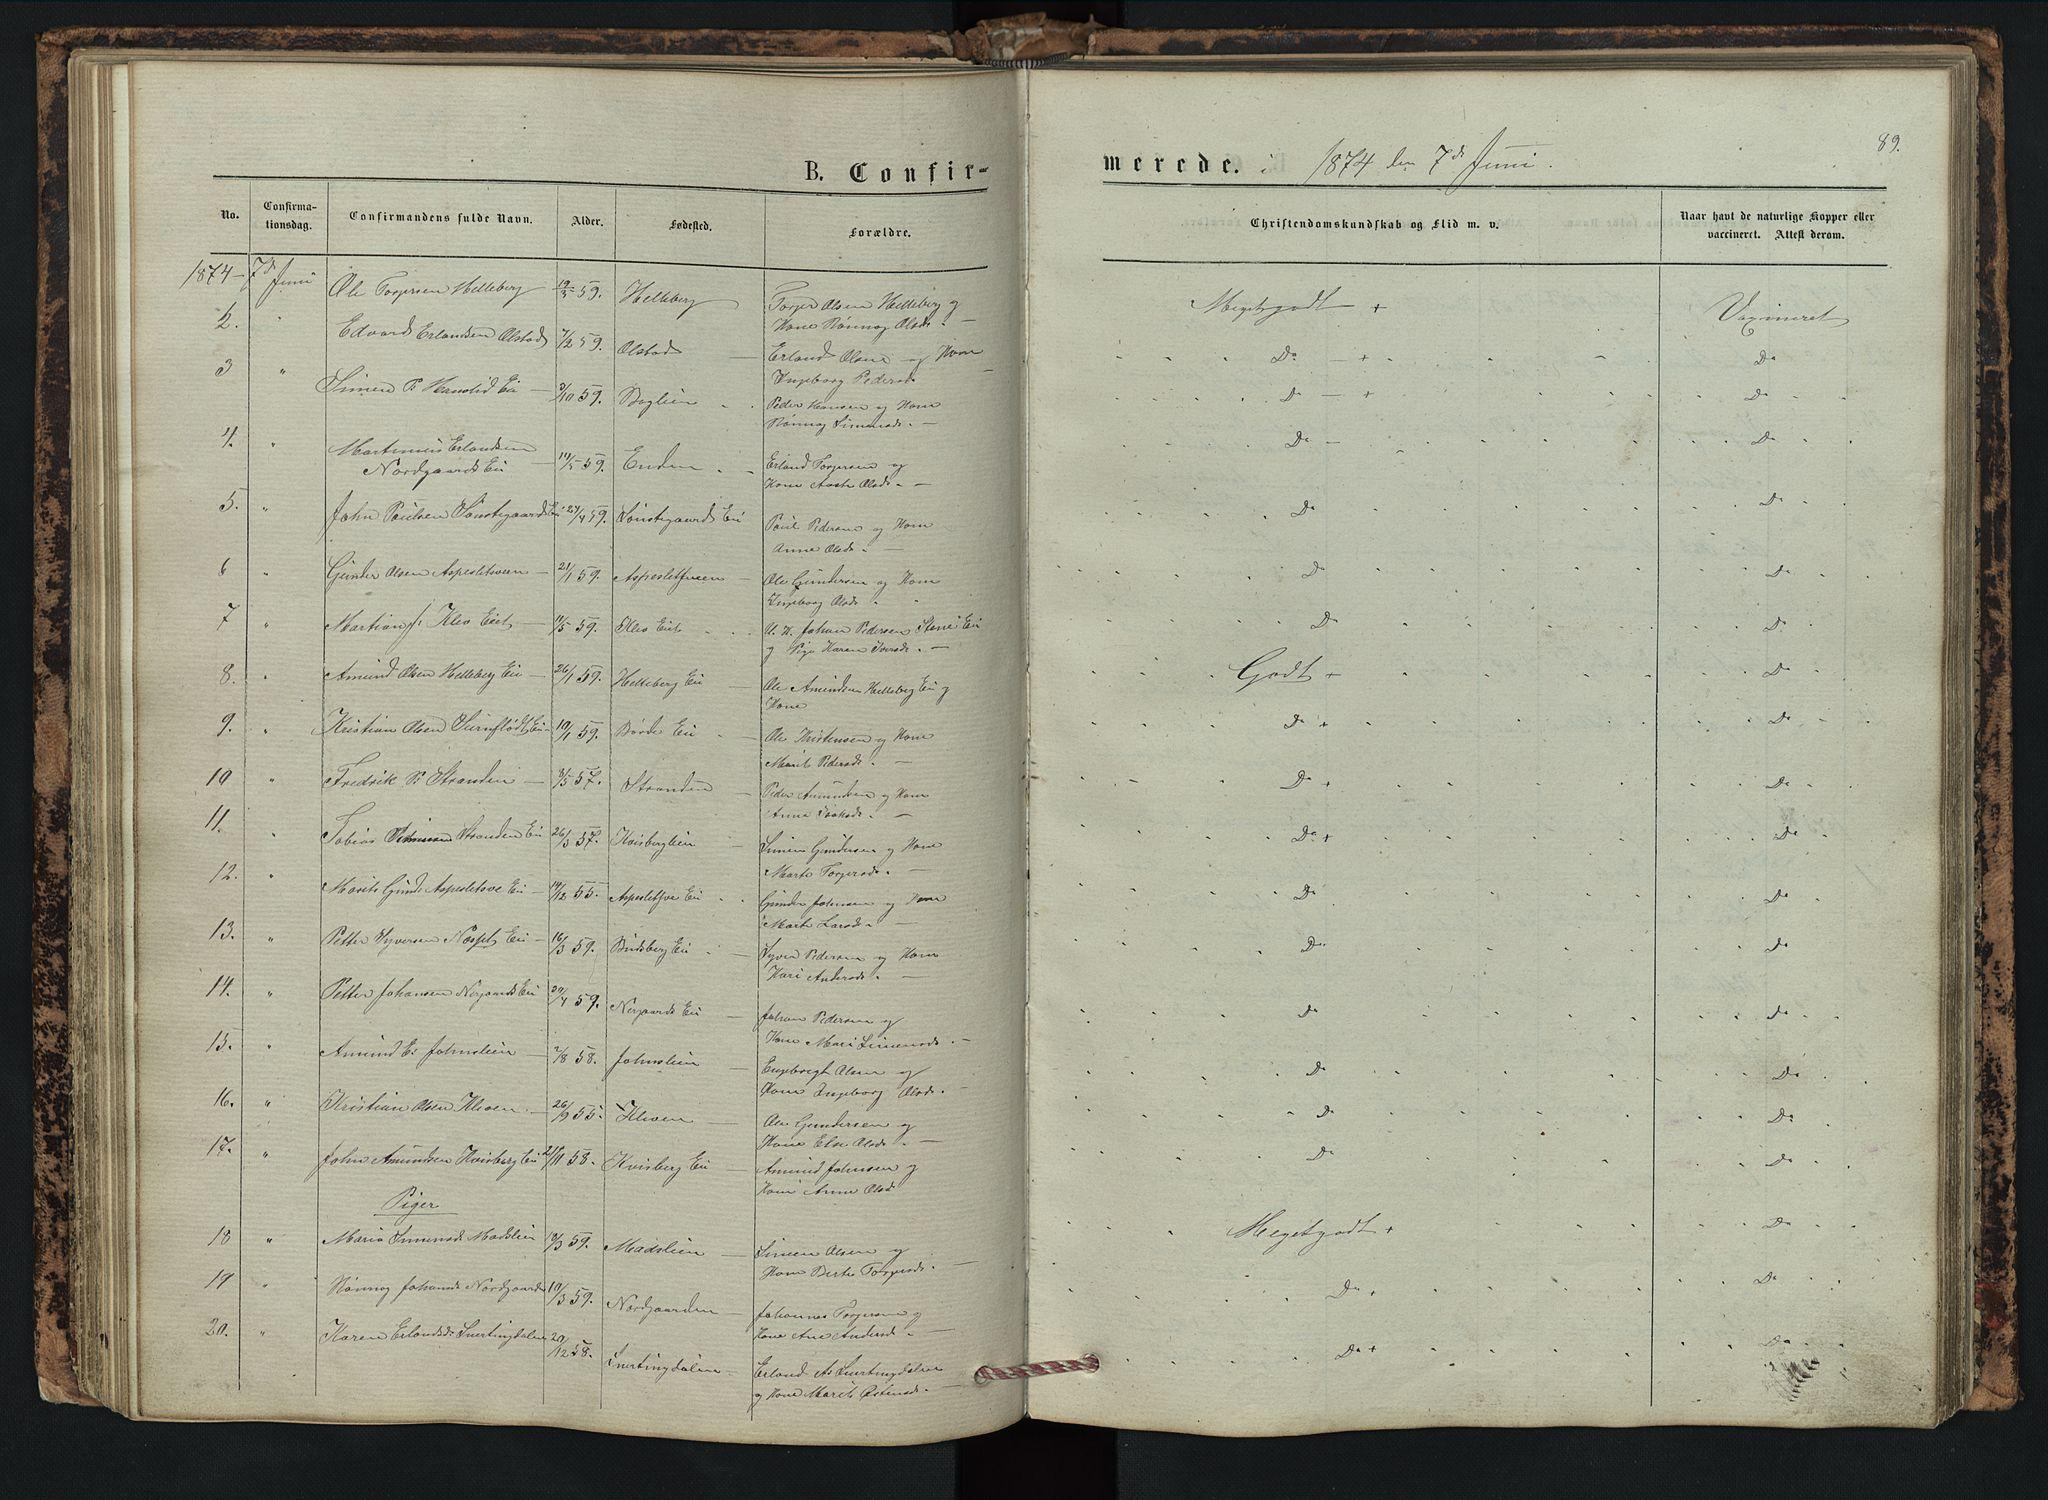 SAH, Vestre Gausdal prestekontor, Klokkerbok nr. 2, 1874-1897, s. 89